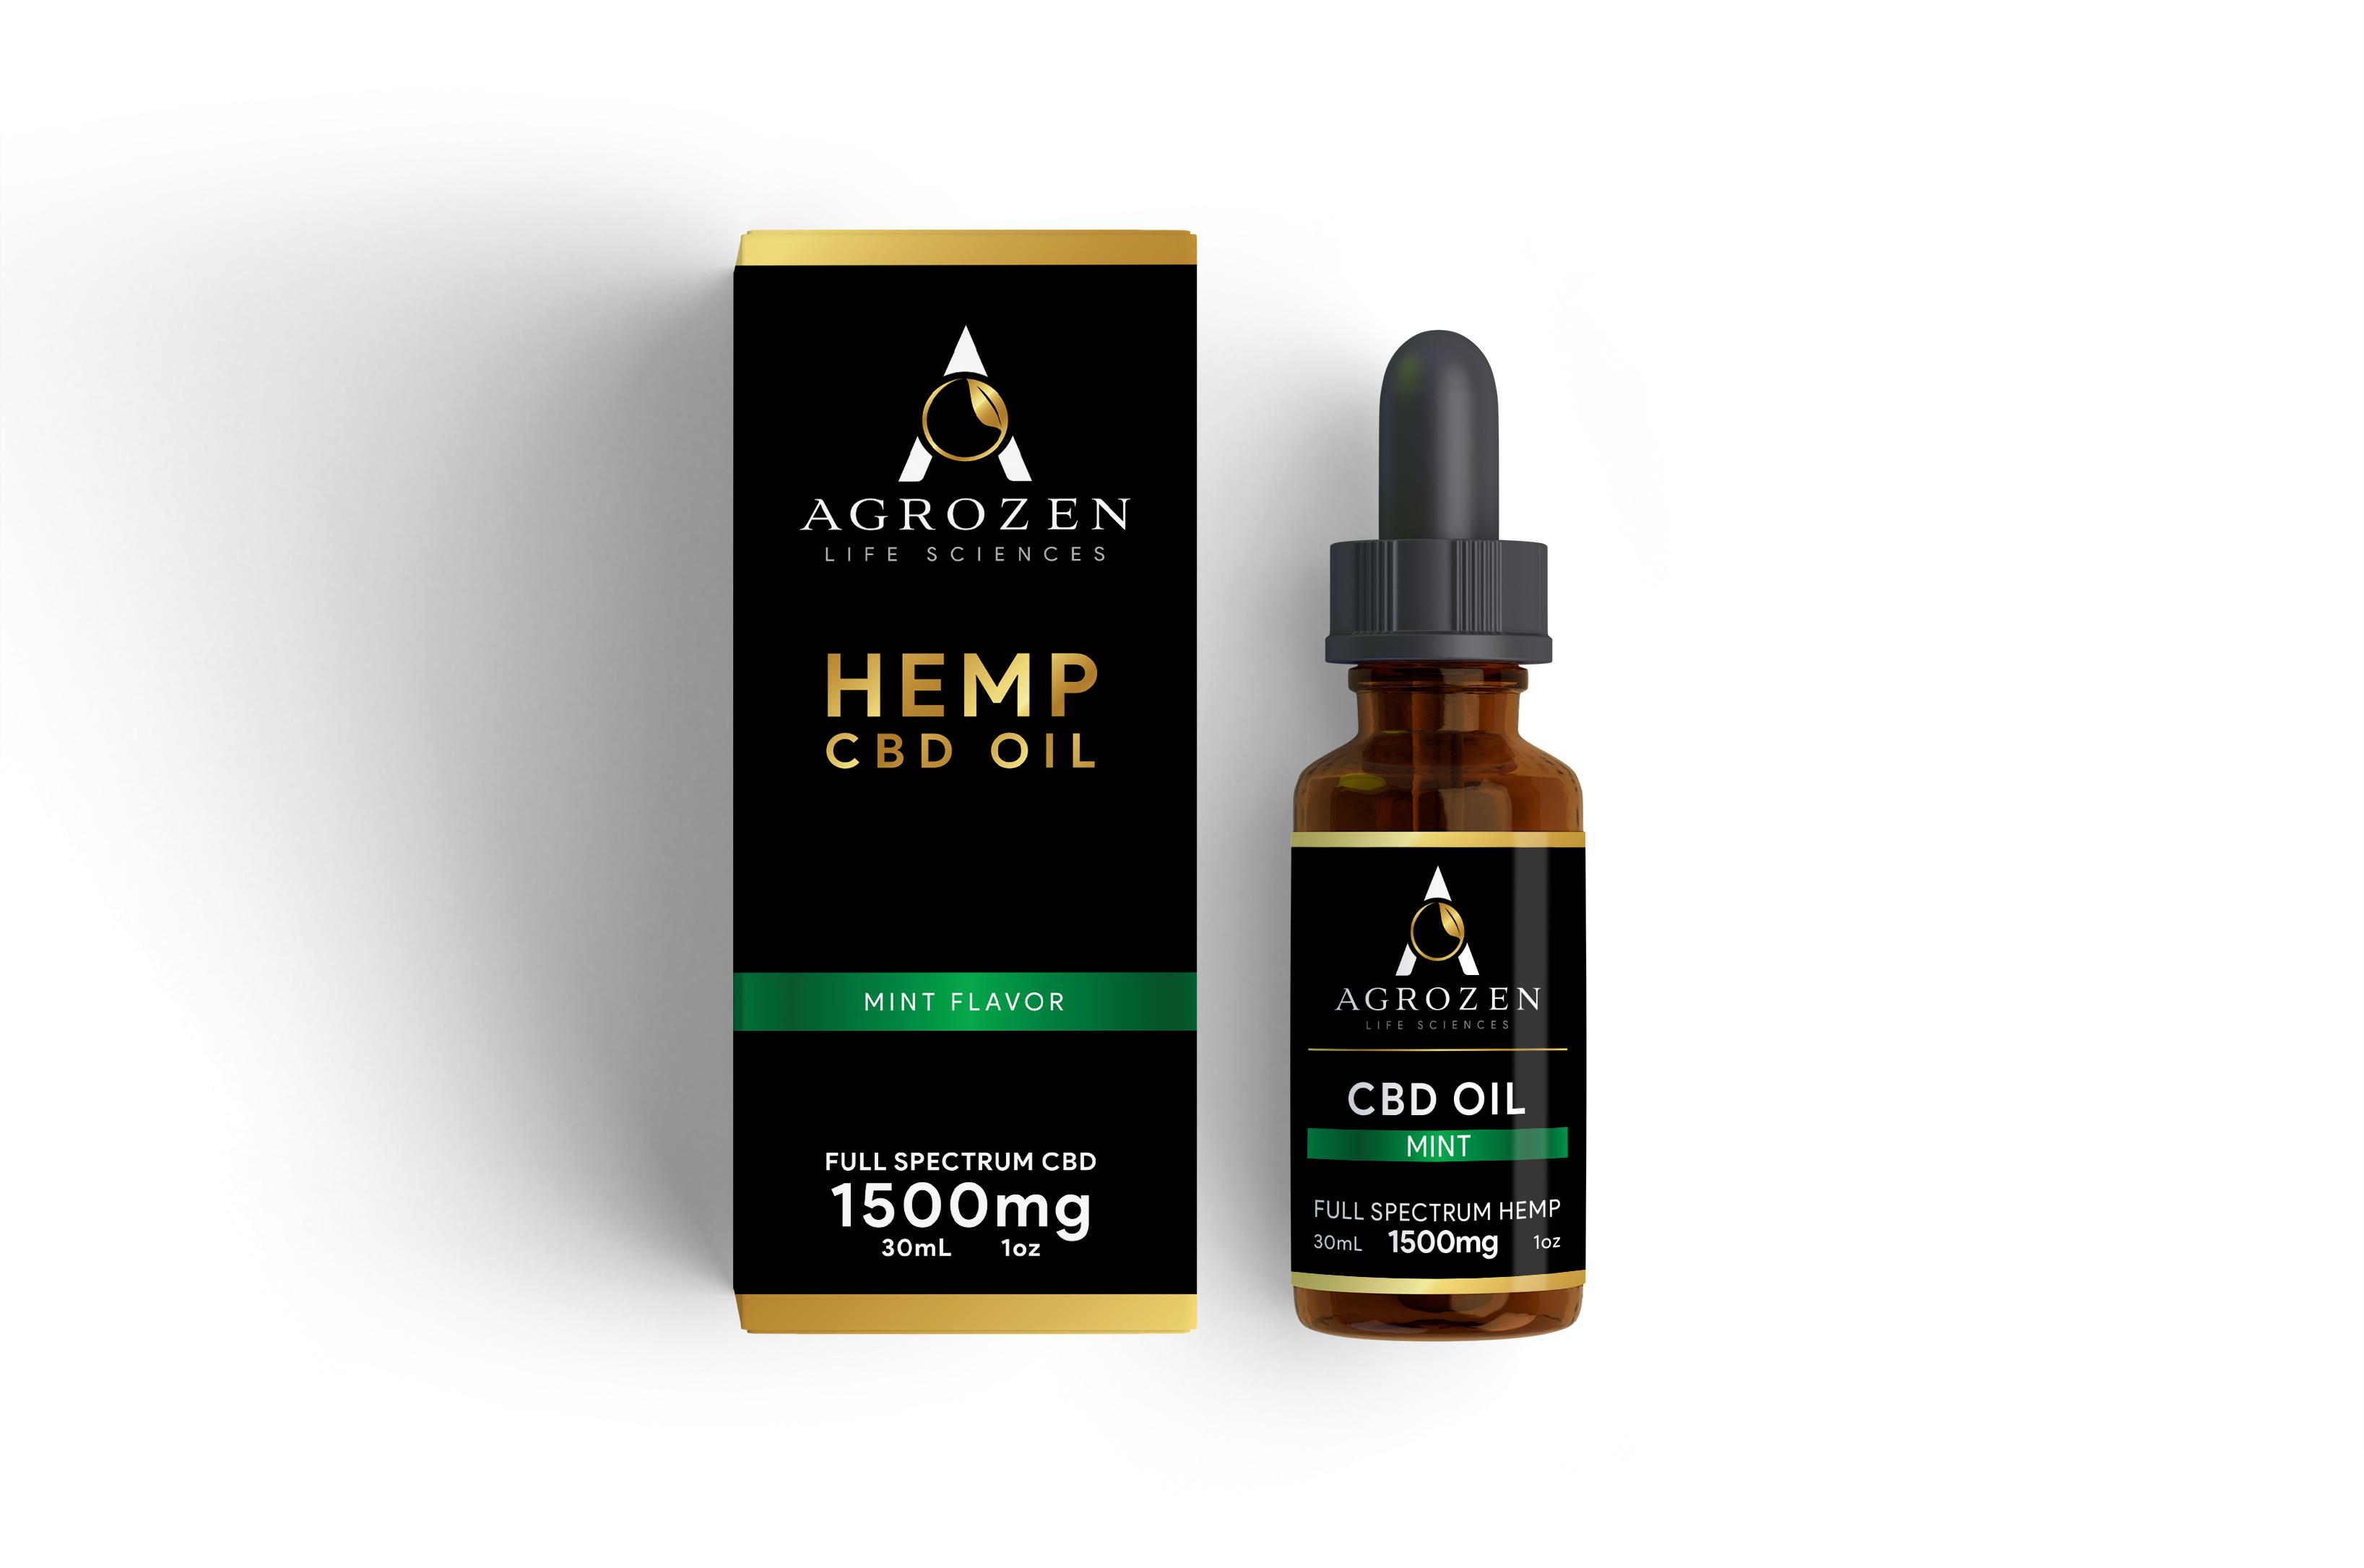 CBD Tincture Oil - 1500mg Full Spectrum Hemp Extract, Mint Flavor